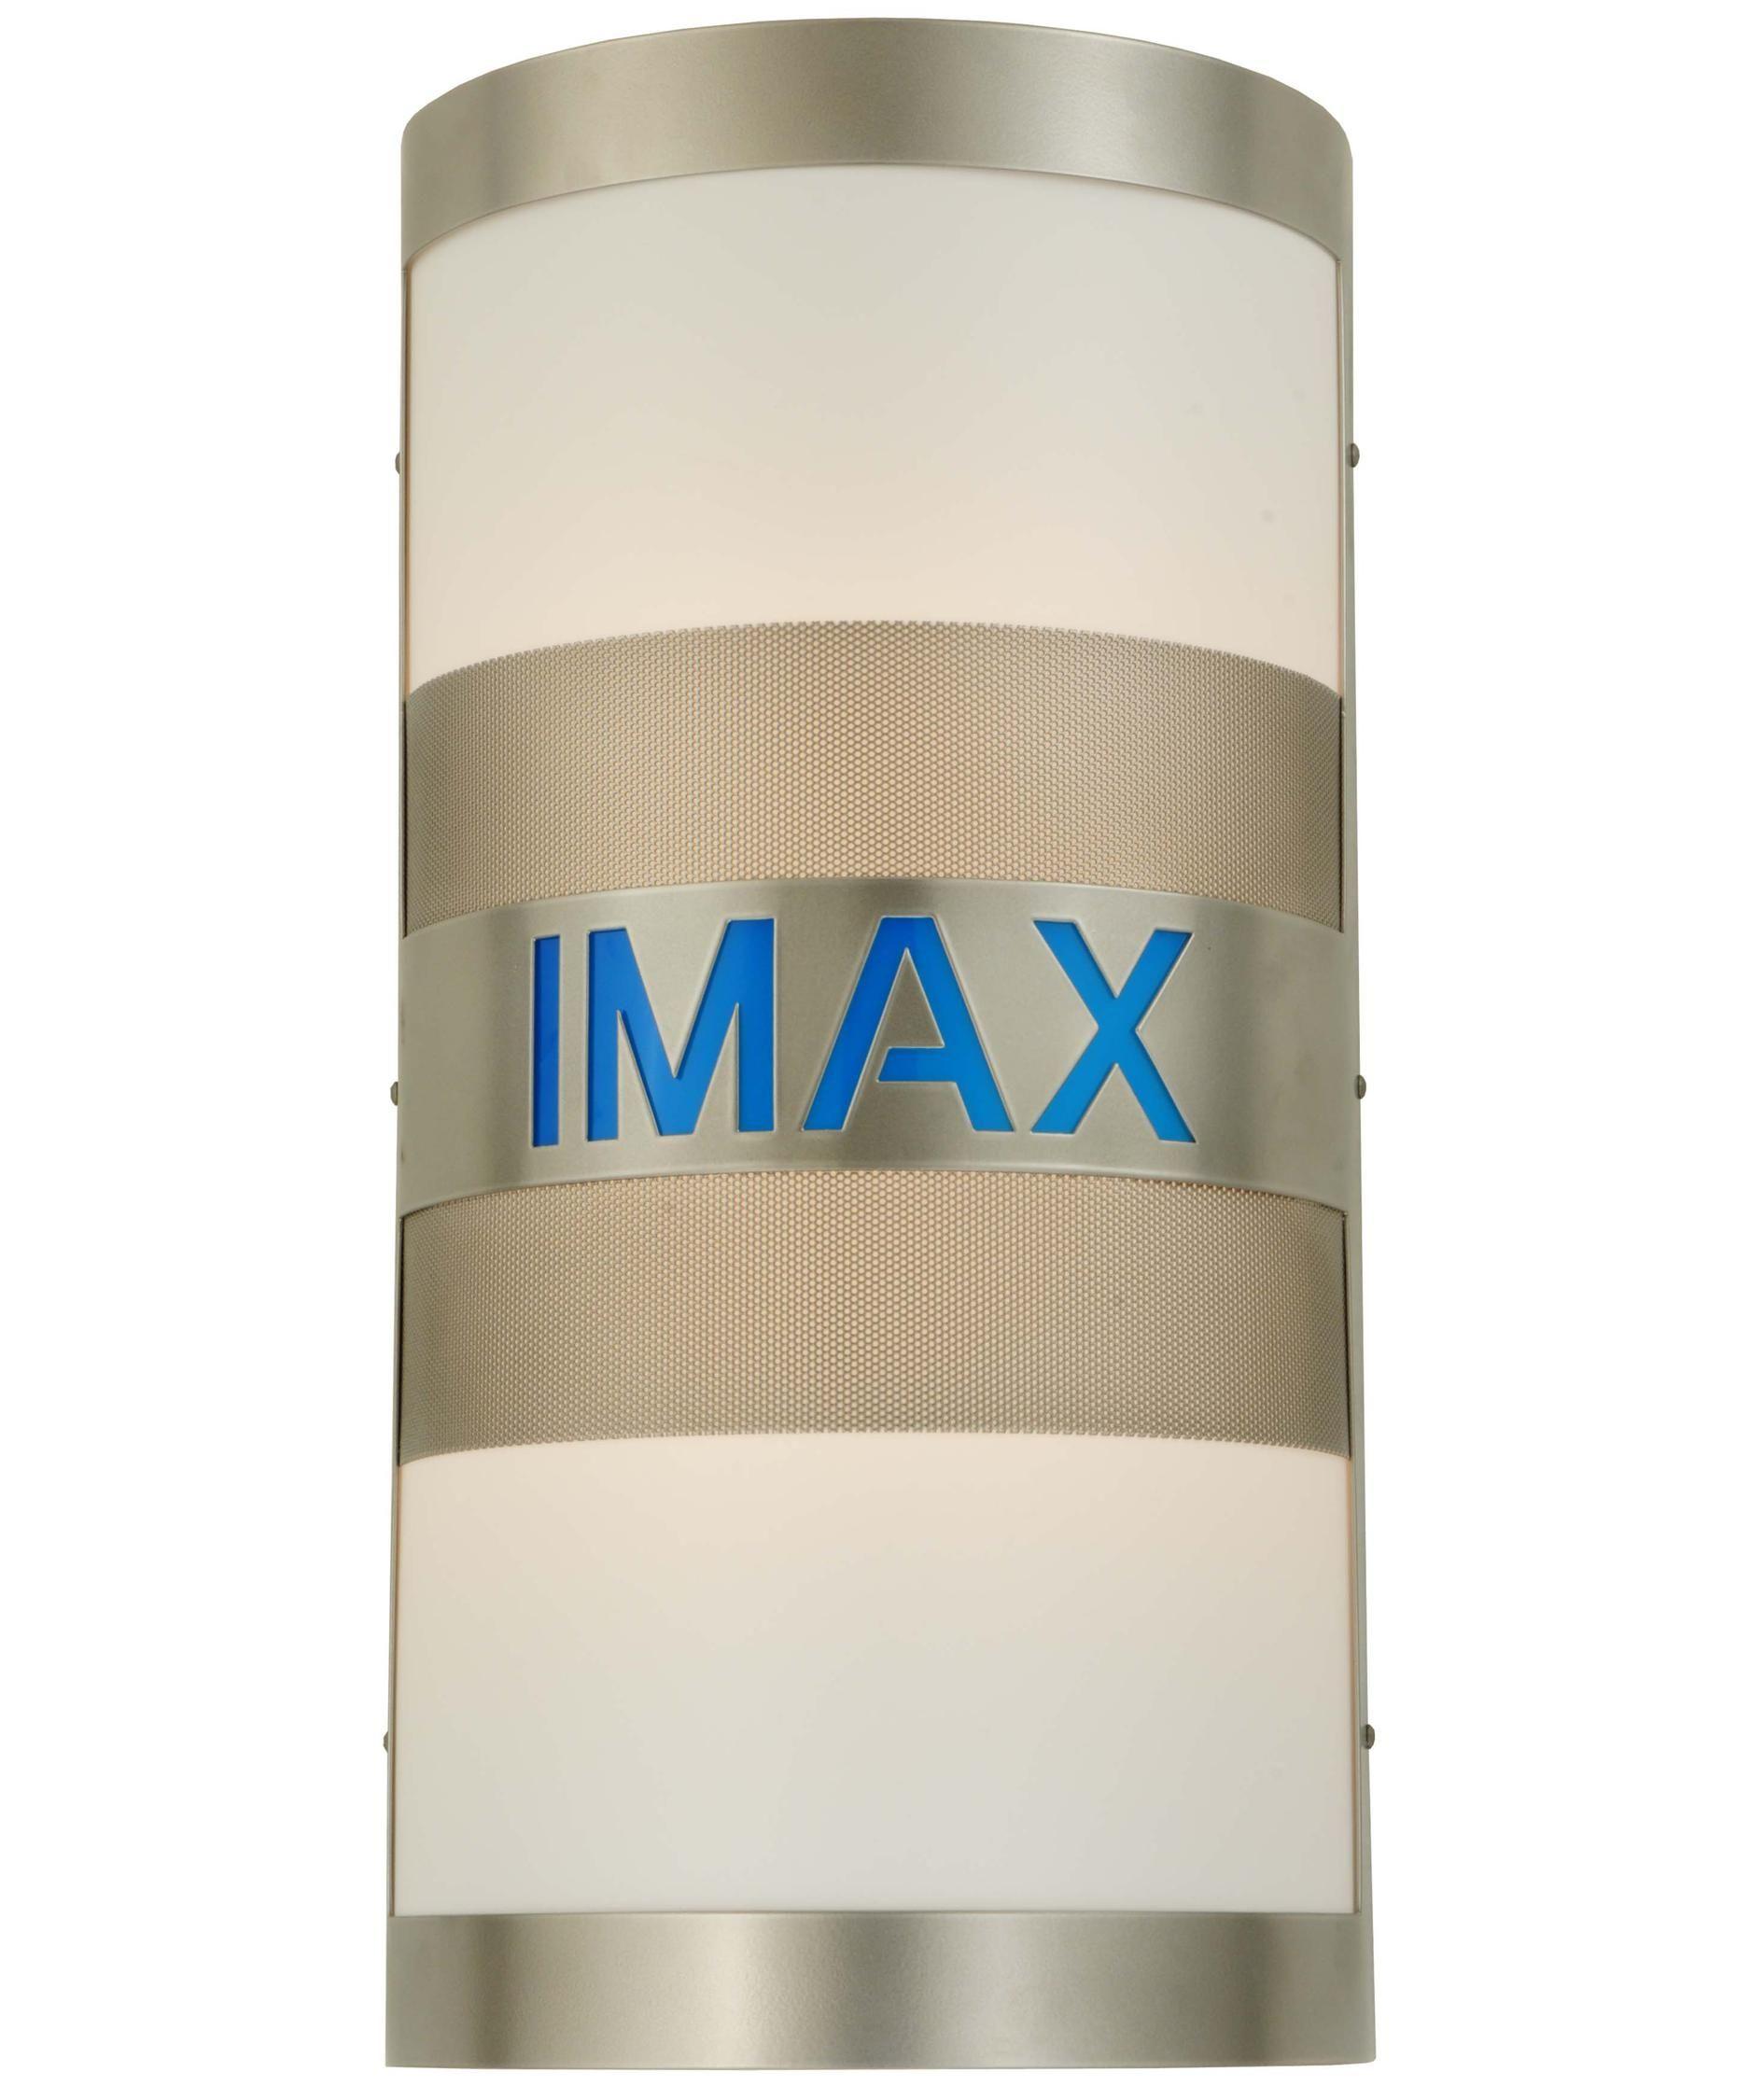 Meyda Lighting IMAX 12 Inch Wide Wall Sconce   Capitol Lighting 1-800lighting.com  sc 1 st  Pinterest & Meyda Lighting IMAX 12 Inch Wide Wall Sconce   Capitol Lighting 1 ... azcodes.com